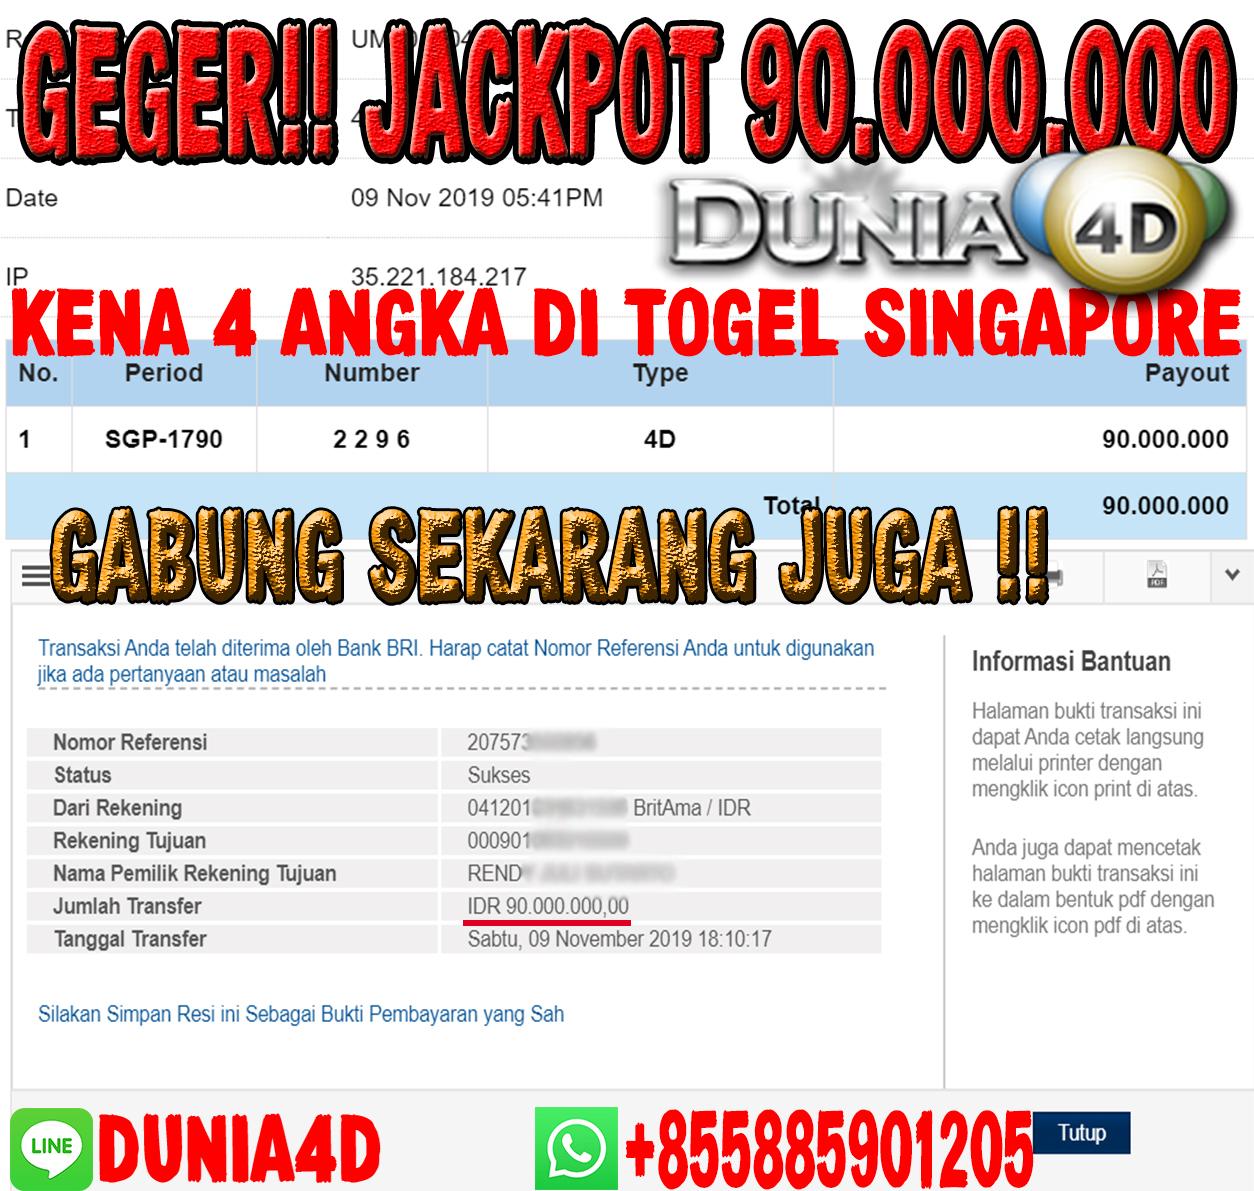 GEGER !! JACKPOT 90.000.000 !! KENA 4 ANGKA DISINGAPORE 9 NOVEMBER 2019